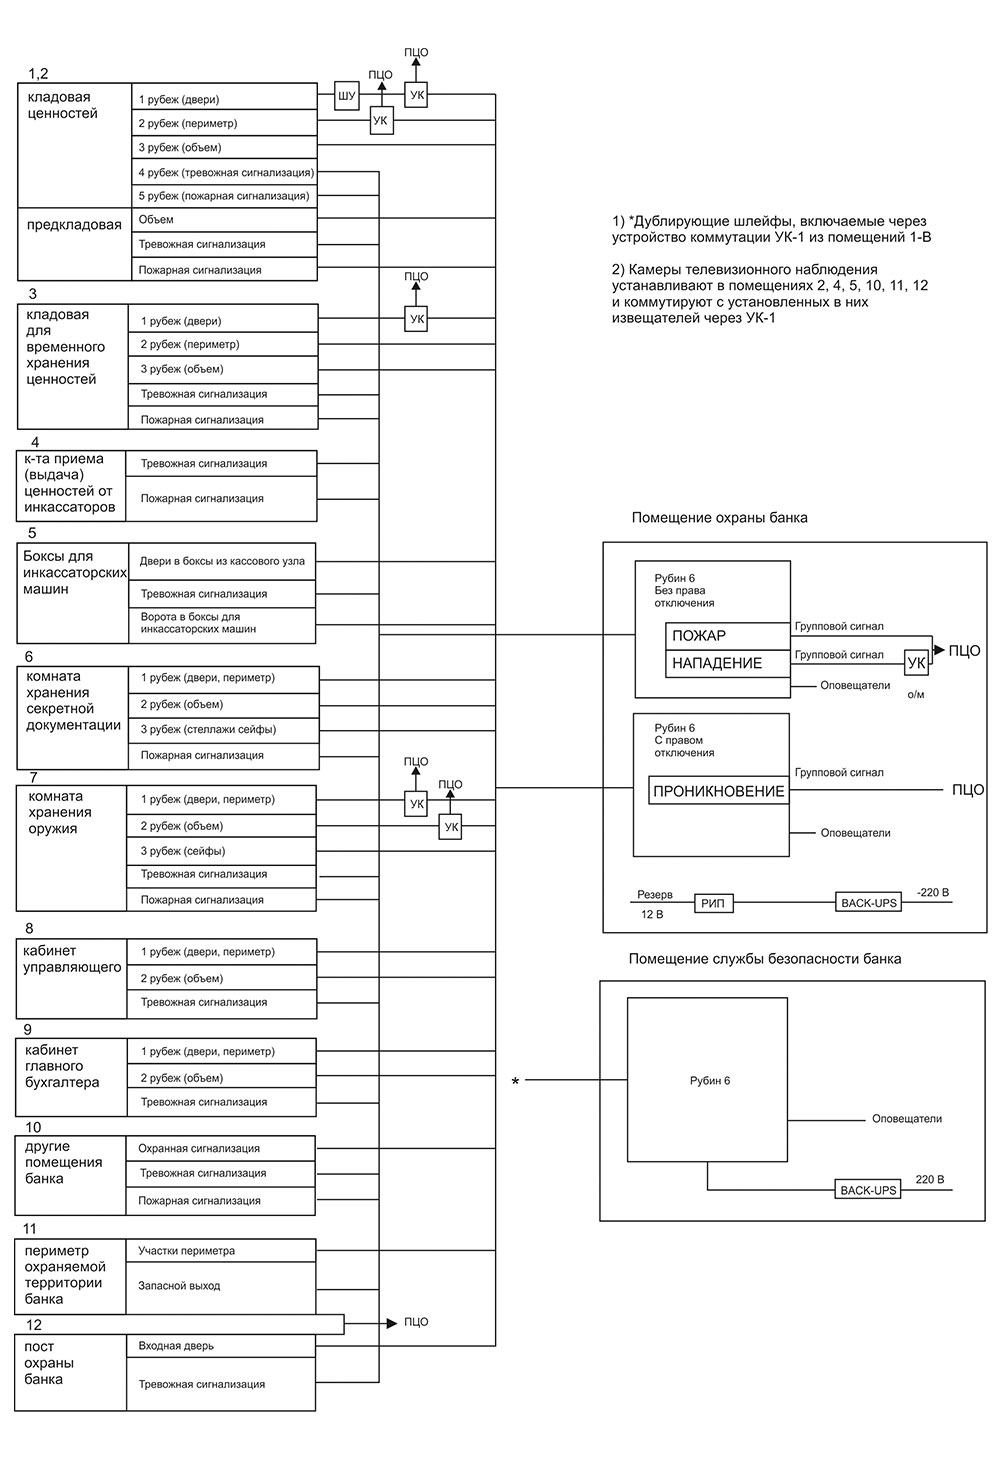 Схема ОПС охраны банка